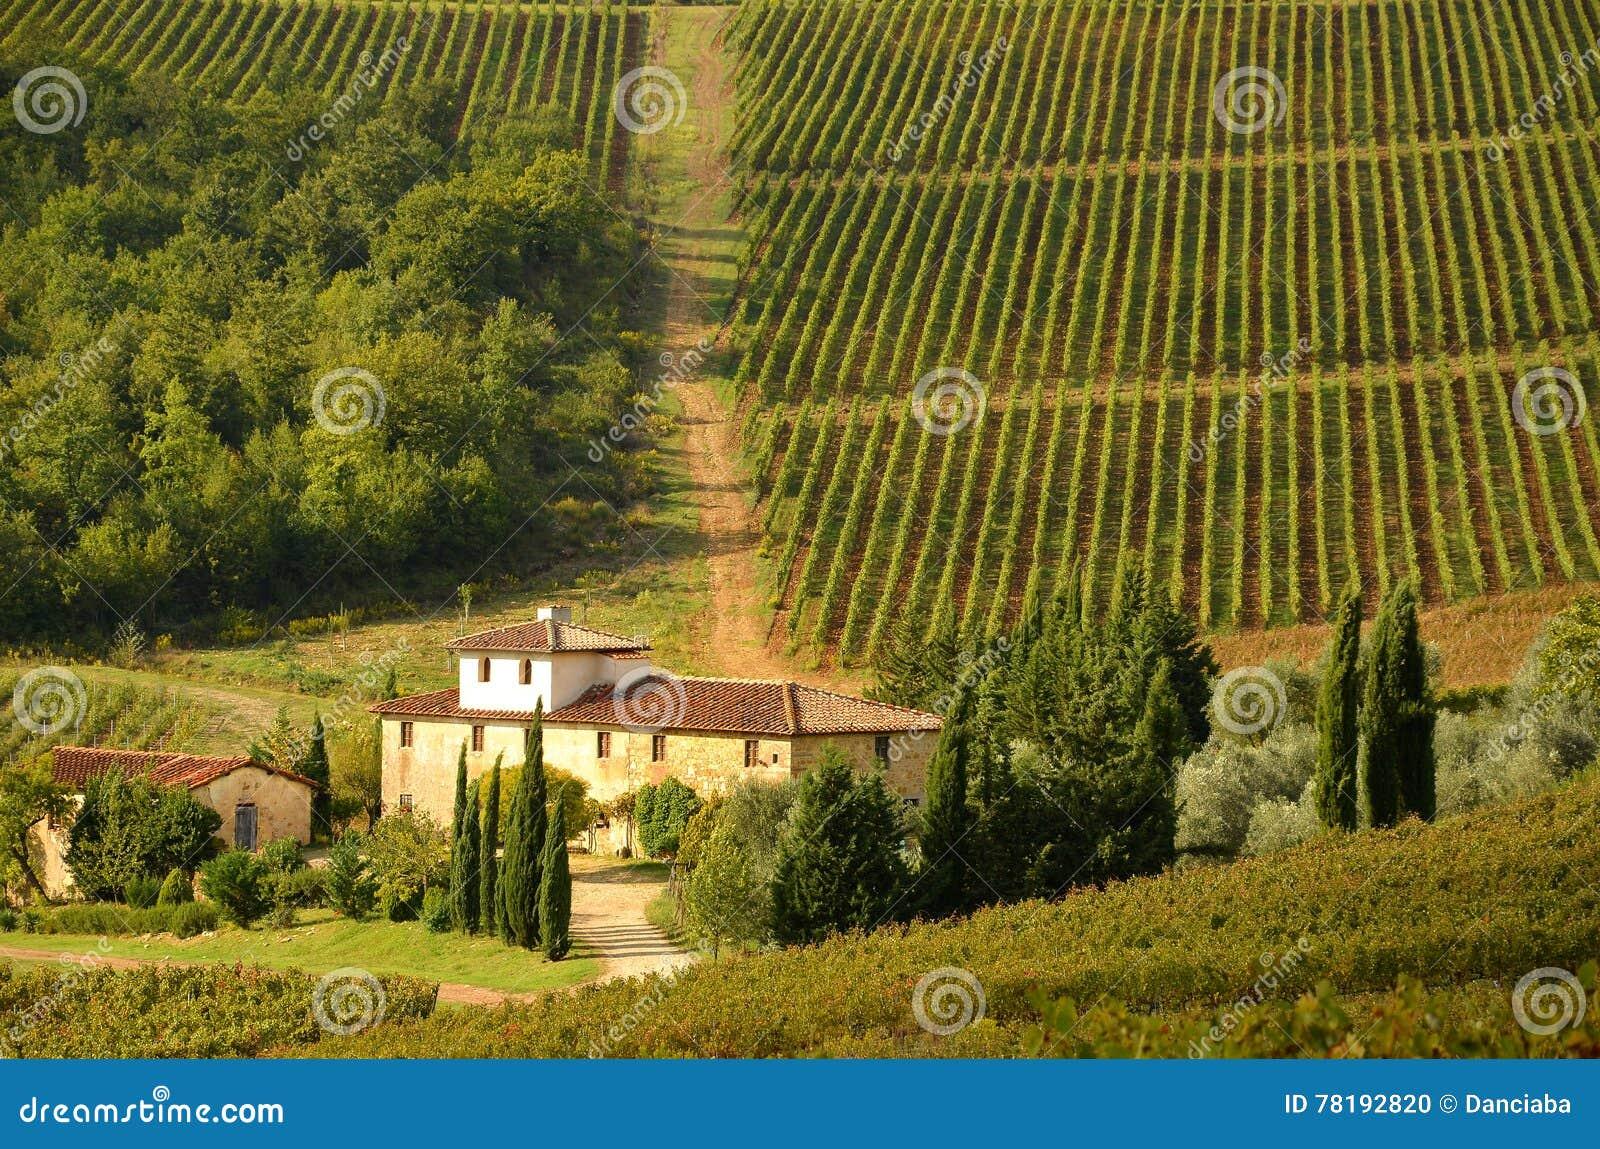 Rows of Vineyard in Chianti, Tuscany